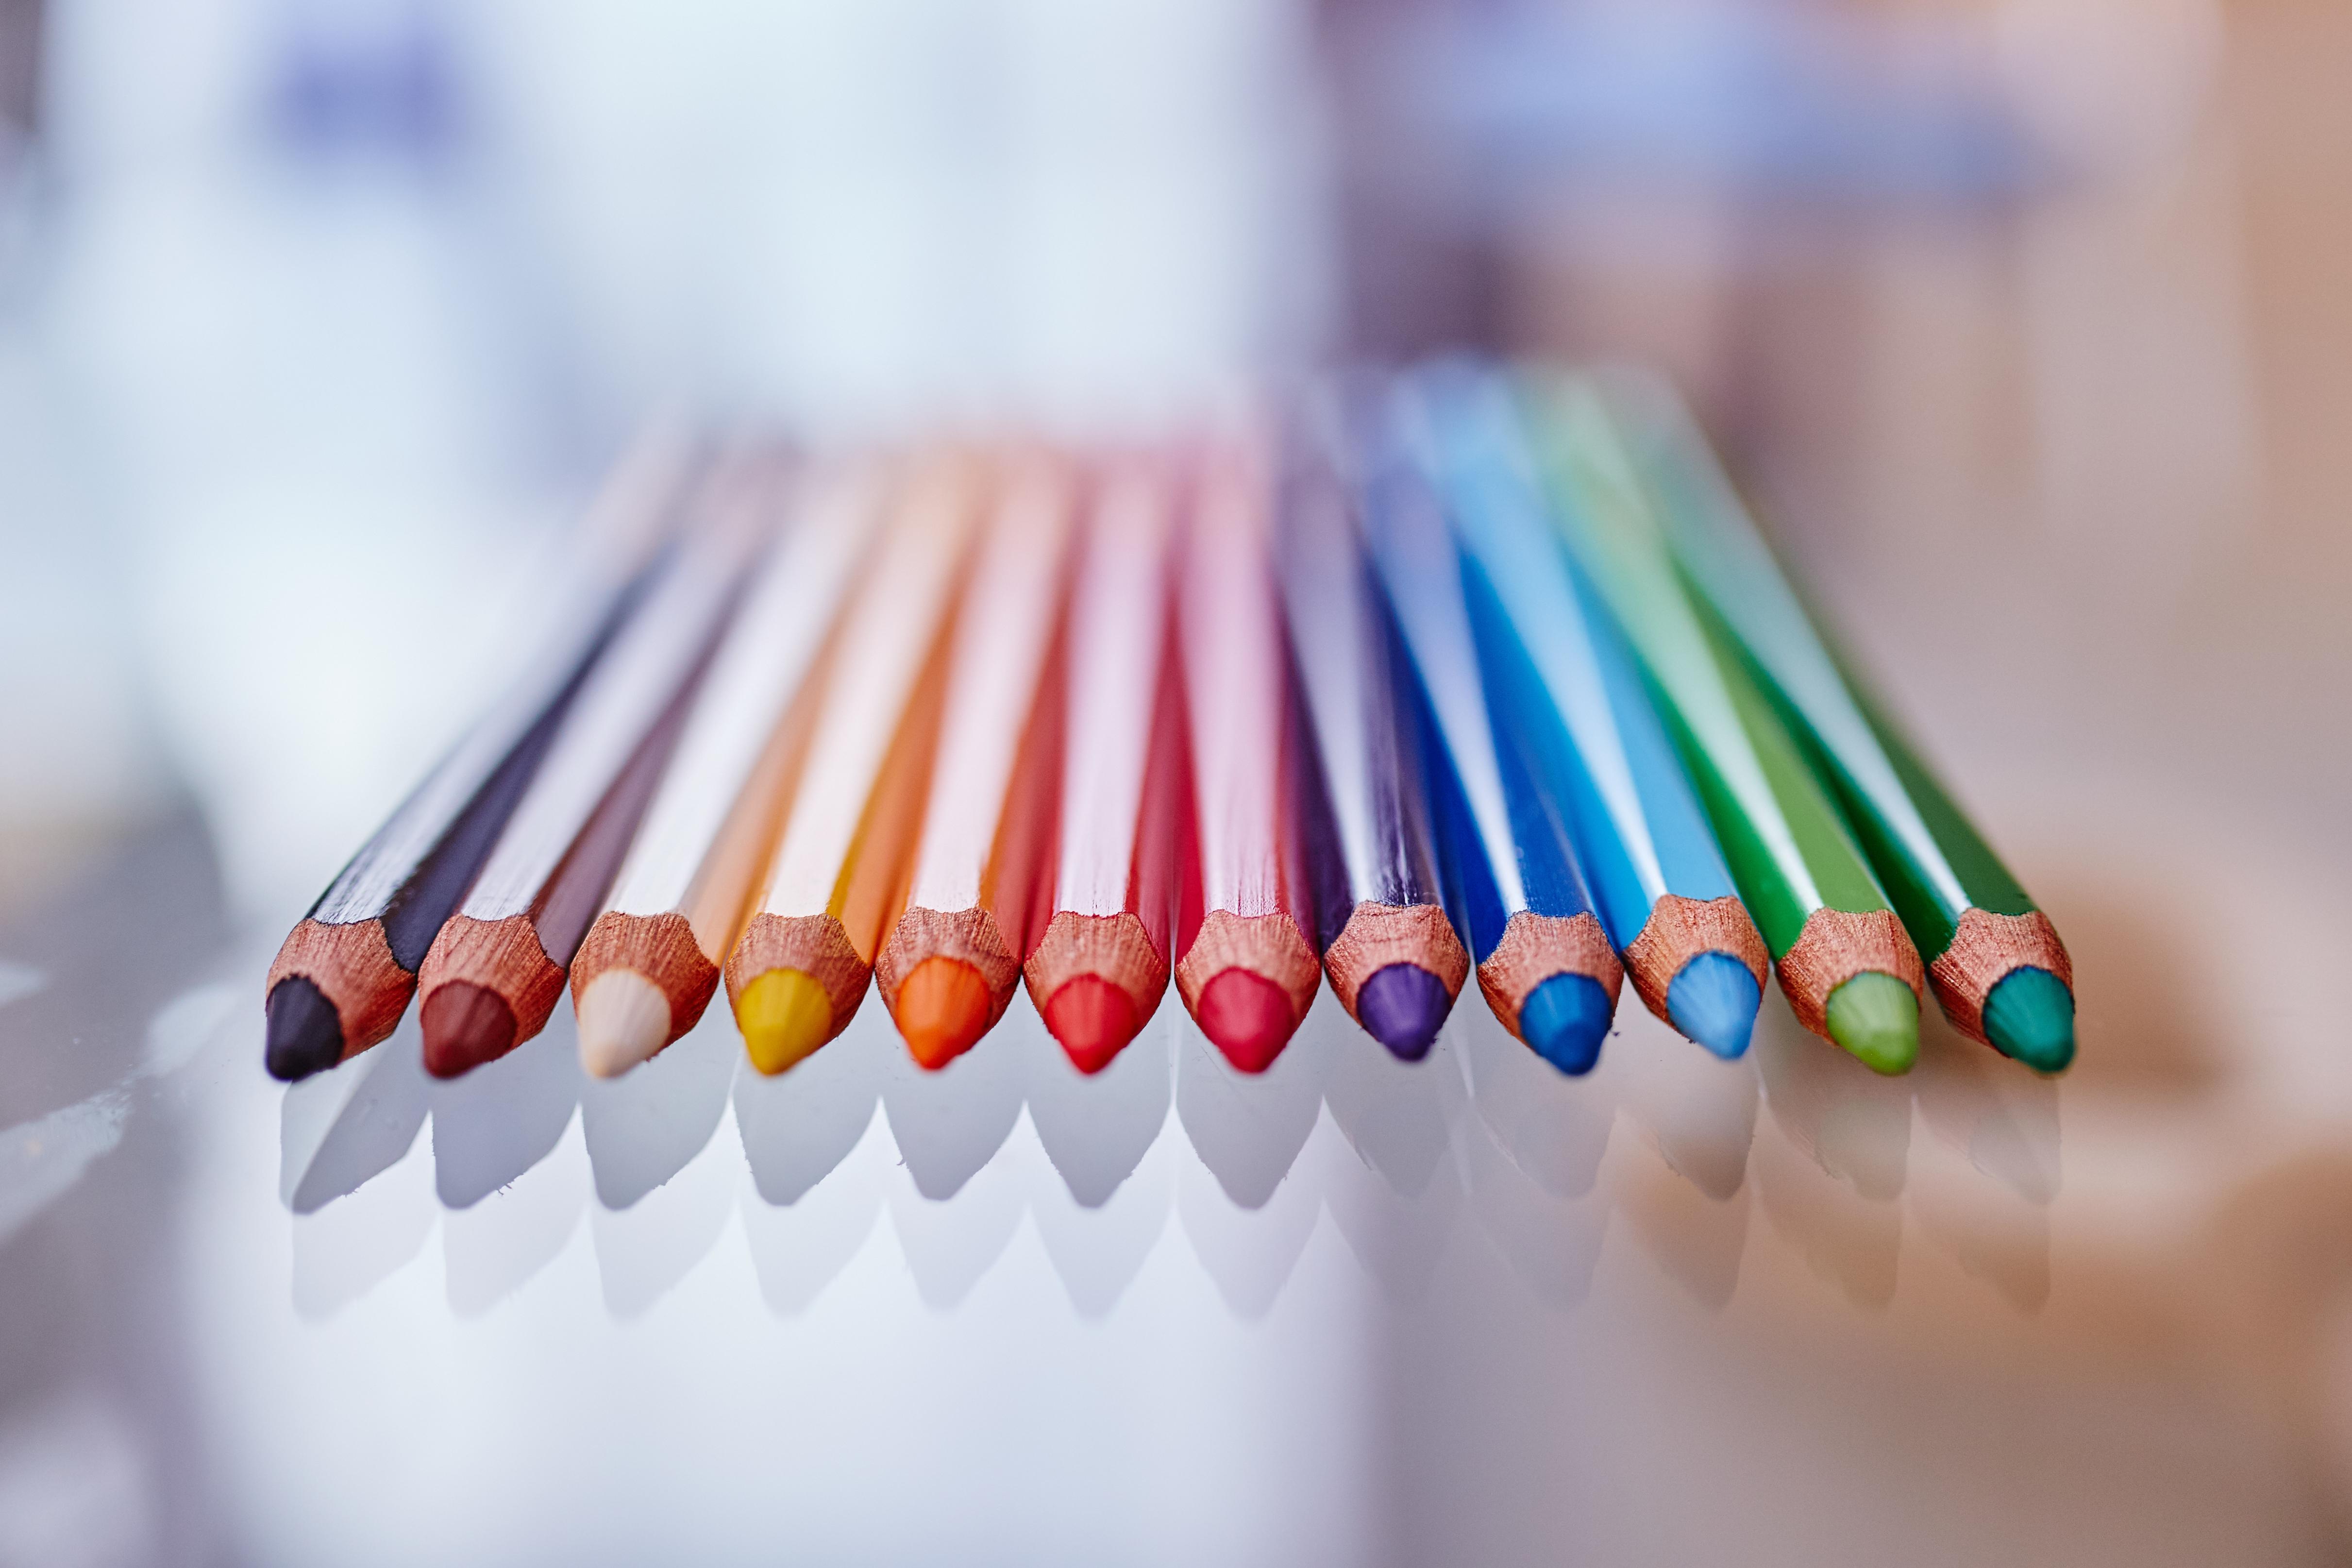 Colors, Blue, Green, Pencils, Pink, HQ Photo